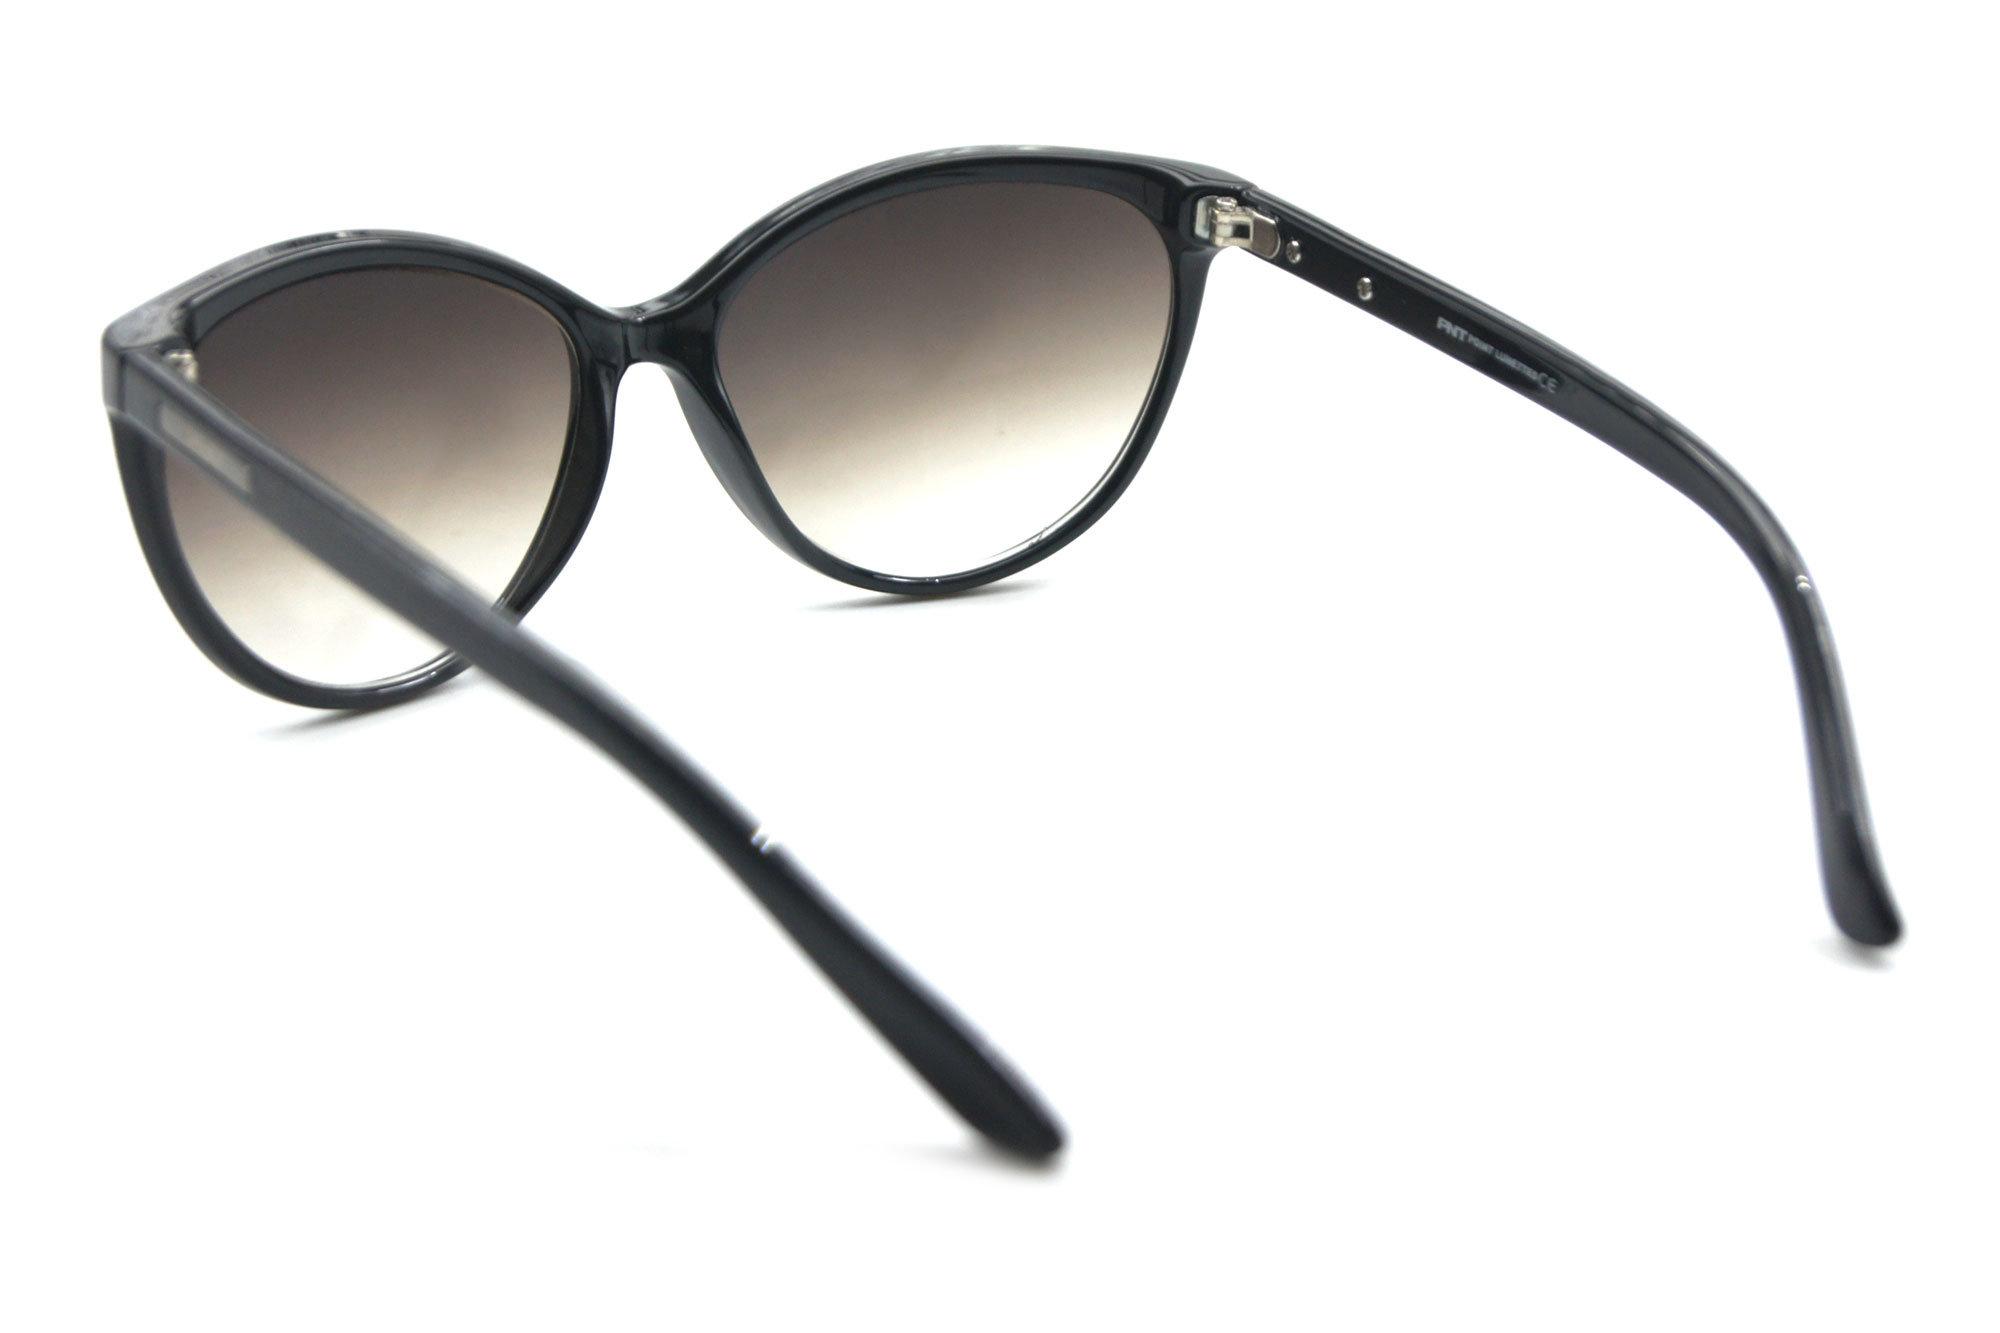 Xiamen Promotion Fashion Brand Polarized Cat Eye Sunglasses for Women